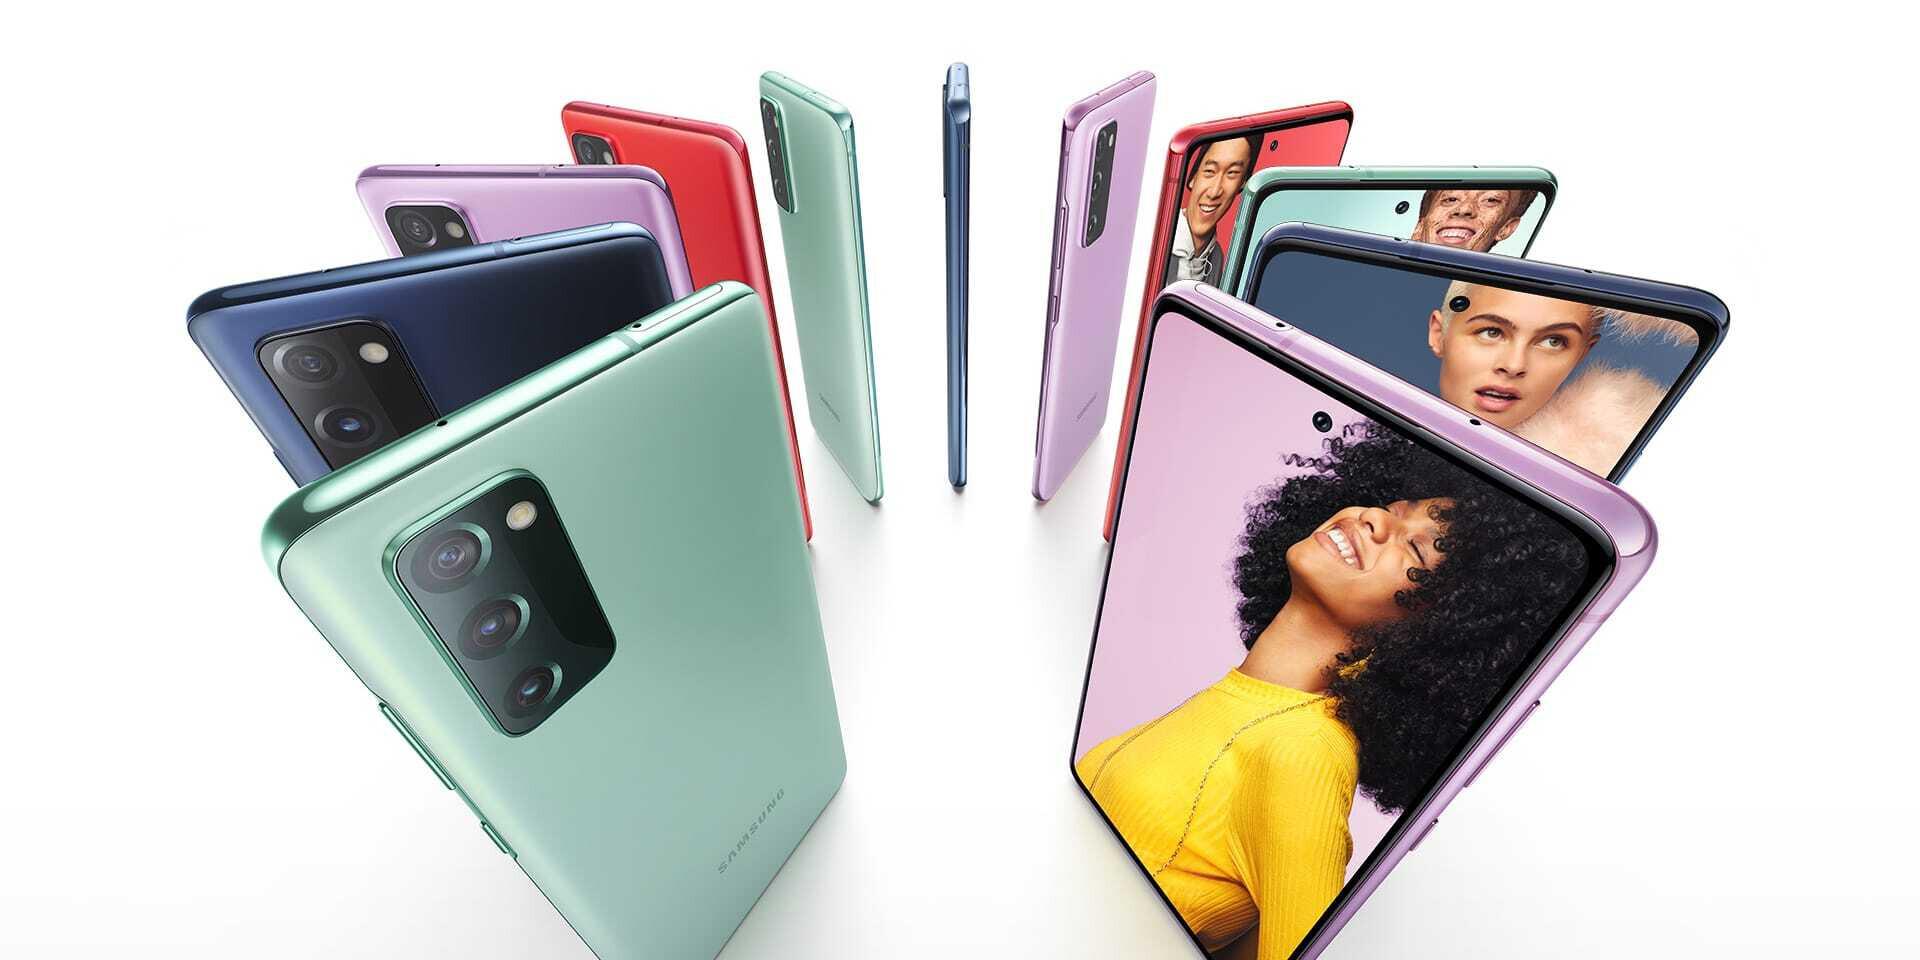 Samsung Galaxy S20 FE ทุกสี - รีวิว Samsung Galaxy S20 FE (Fan Edition) แชมป์ด้านราคา